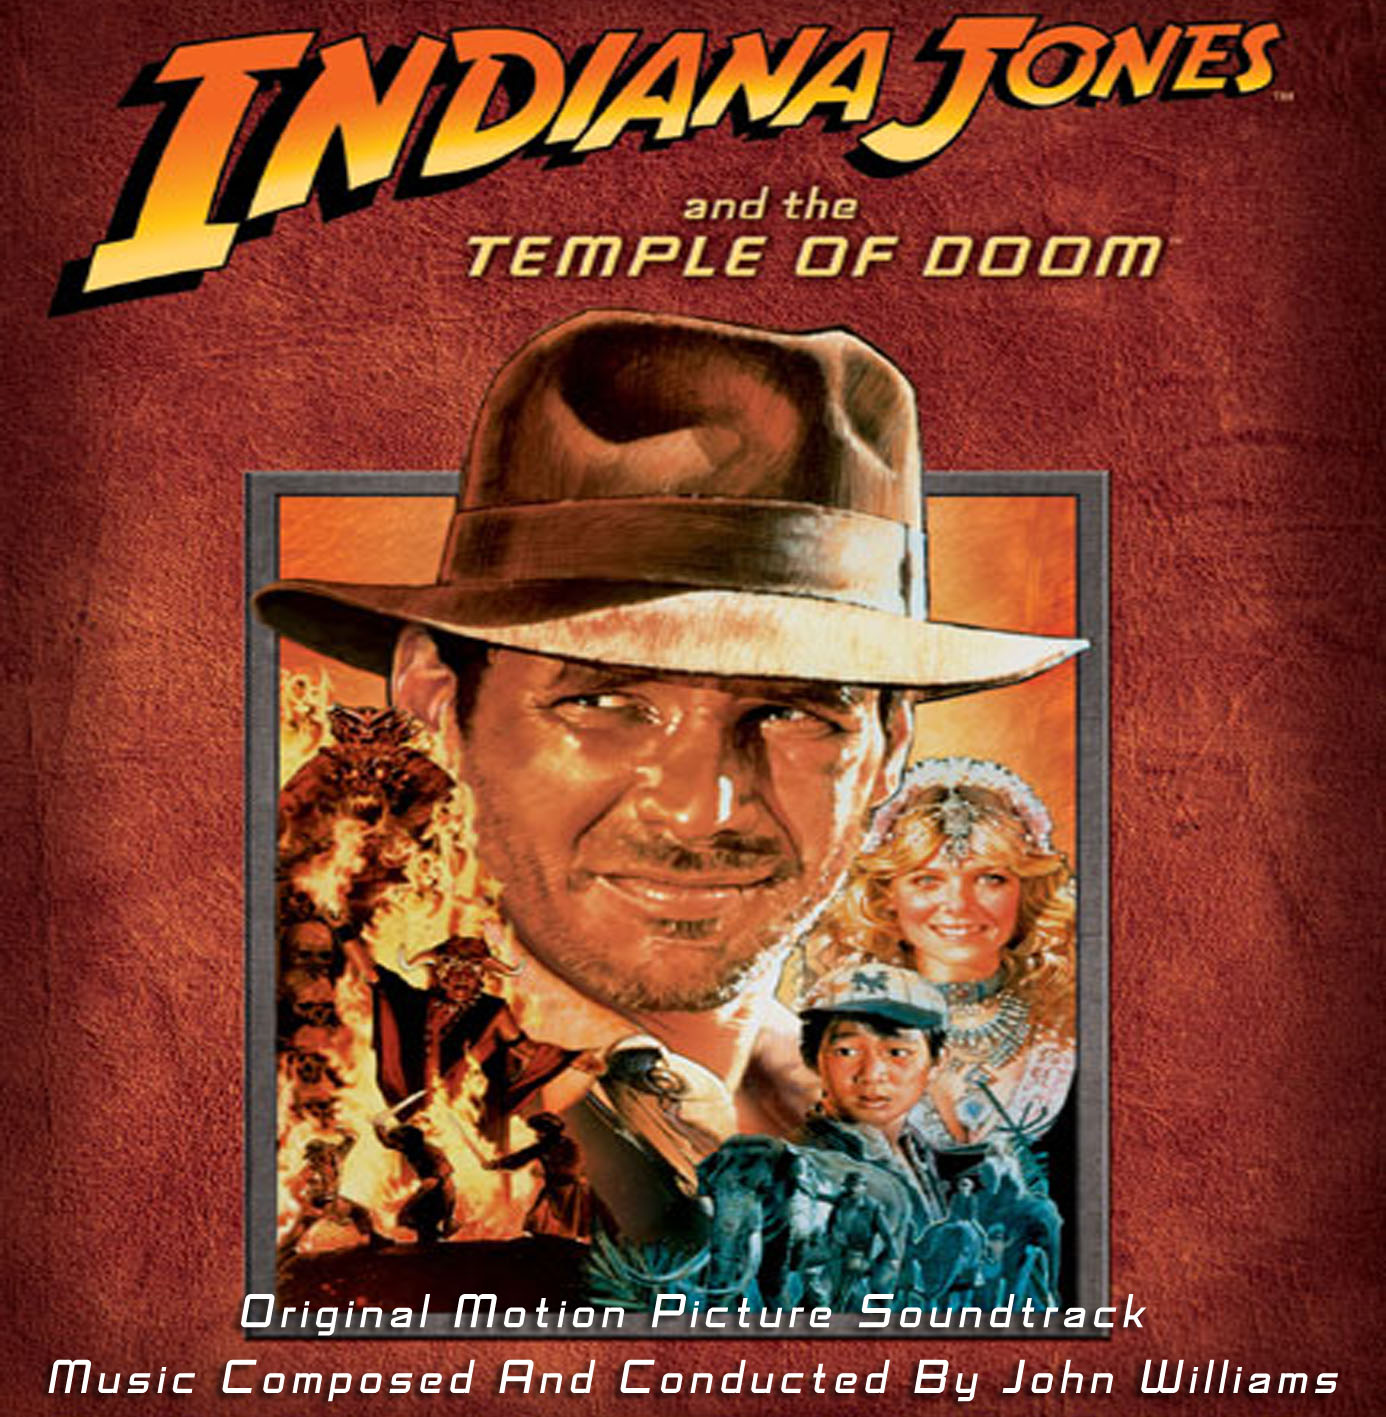 Precious Stones of Wisdom: Life Lessons from Indiana Jones